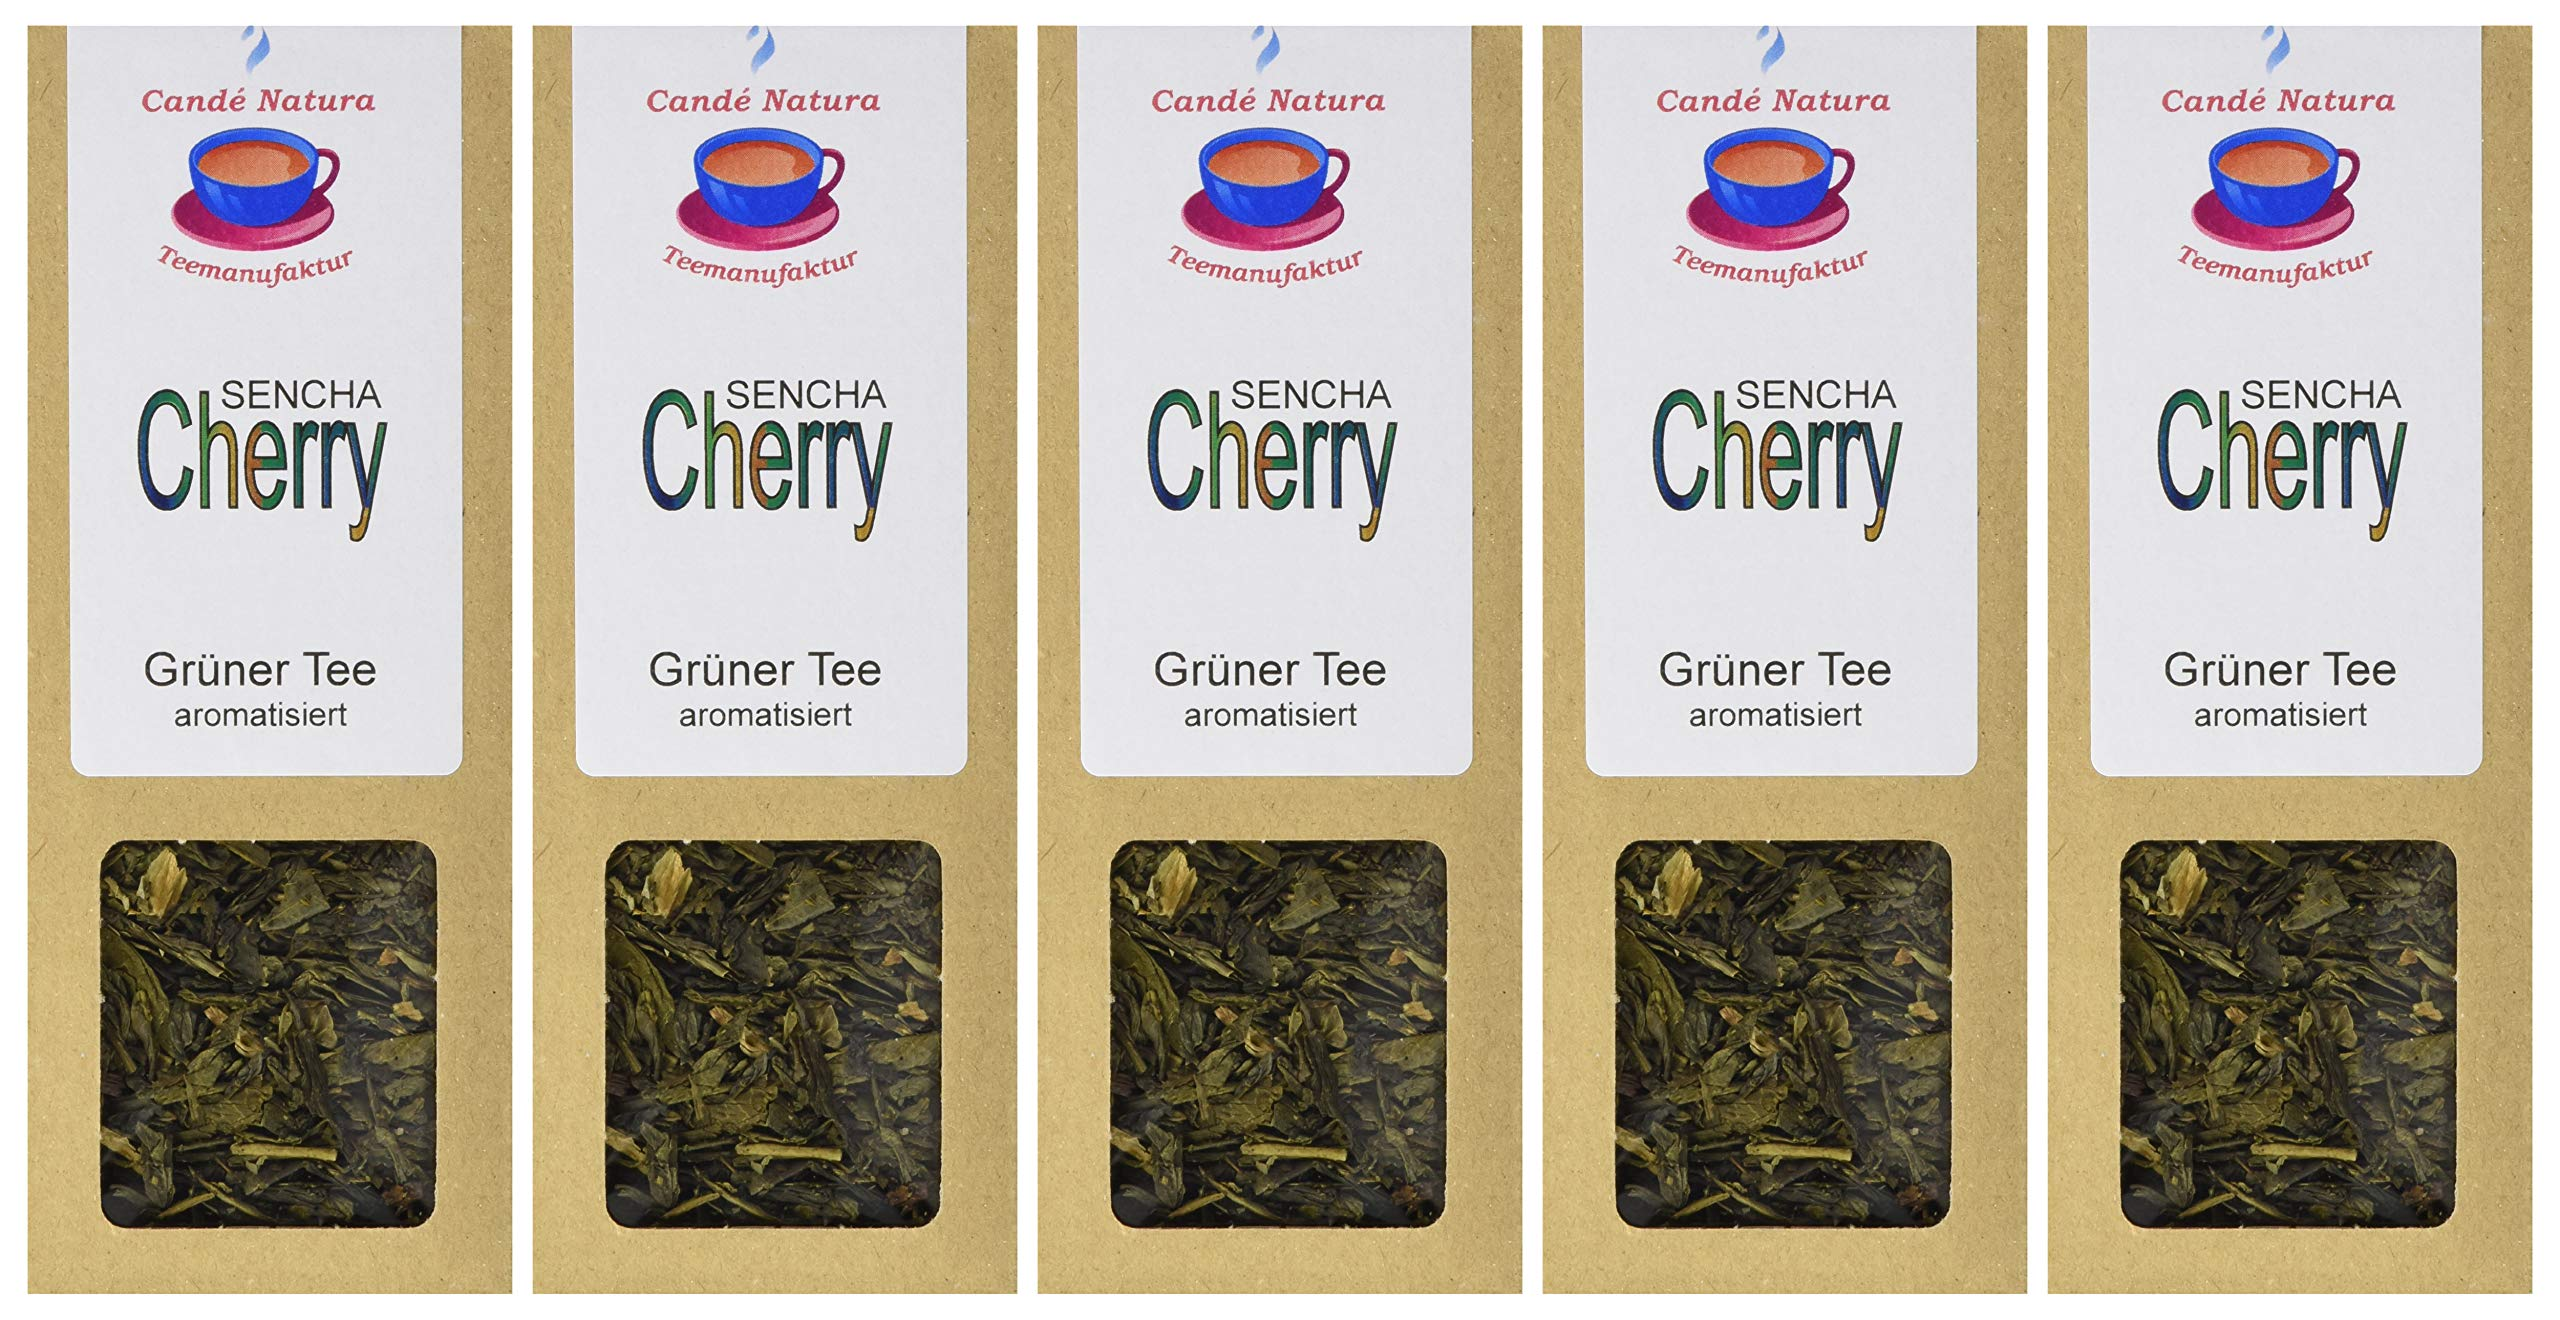 Cand-Natura-Teemanufaktur-Cherry-Grnteemischung-aromatisiert-5er-Pack-5-x-75-g